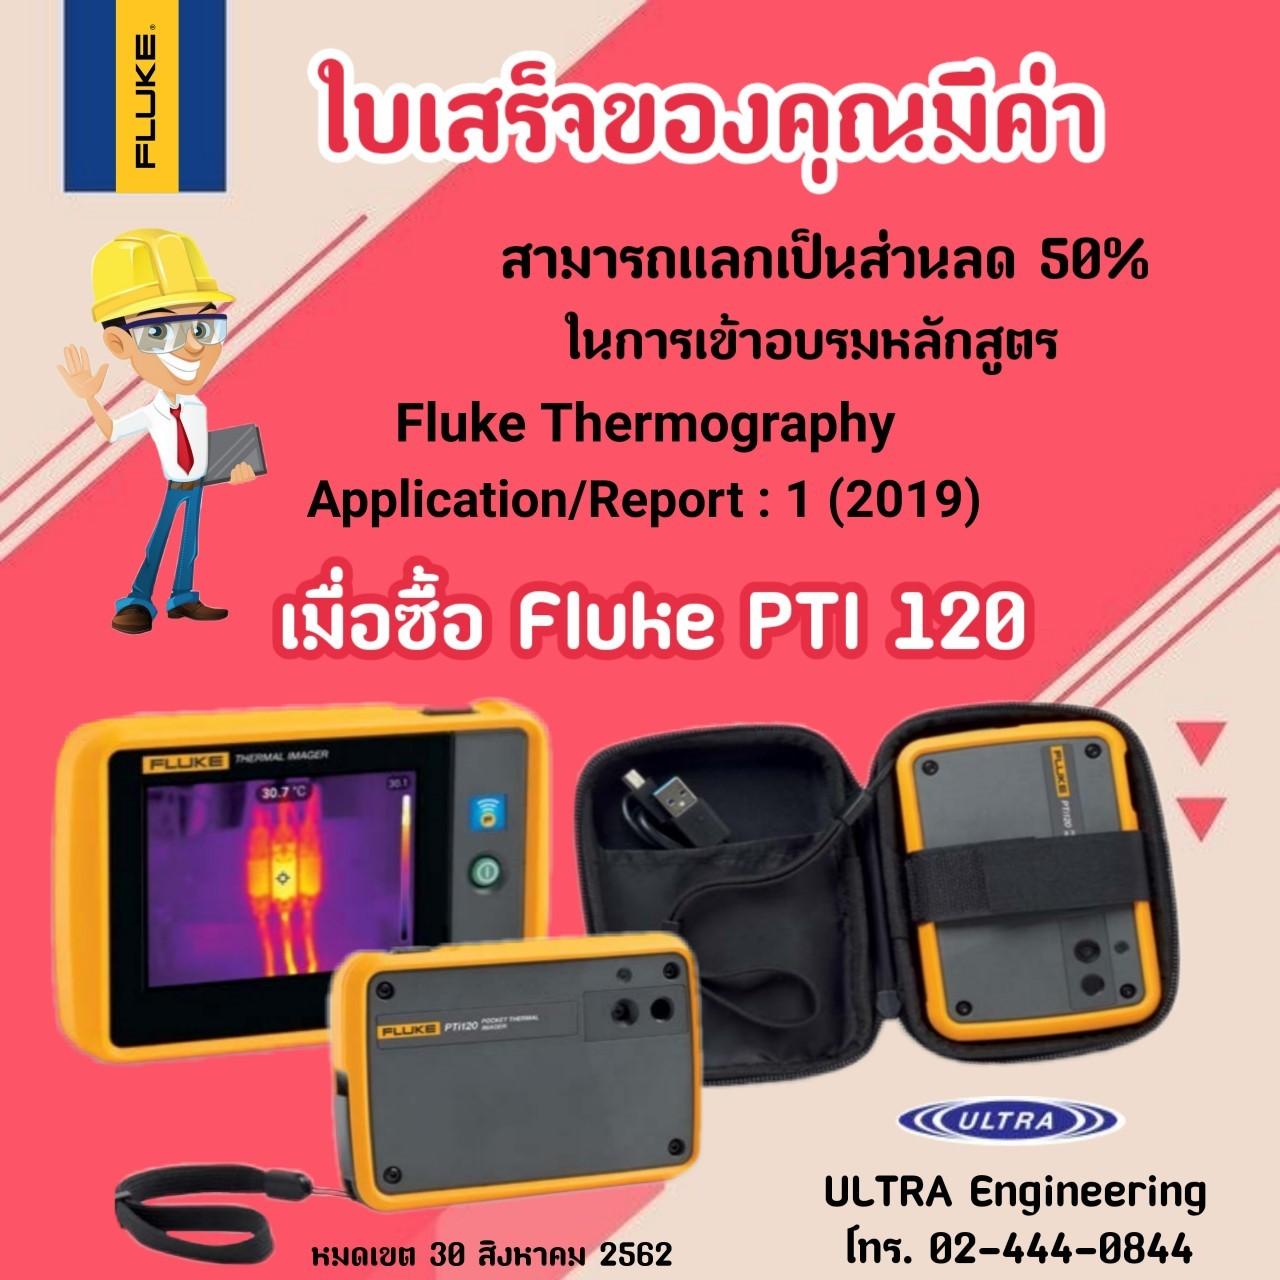 Promotion Fluke PTI120